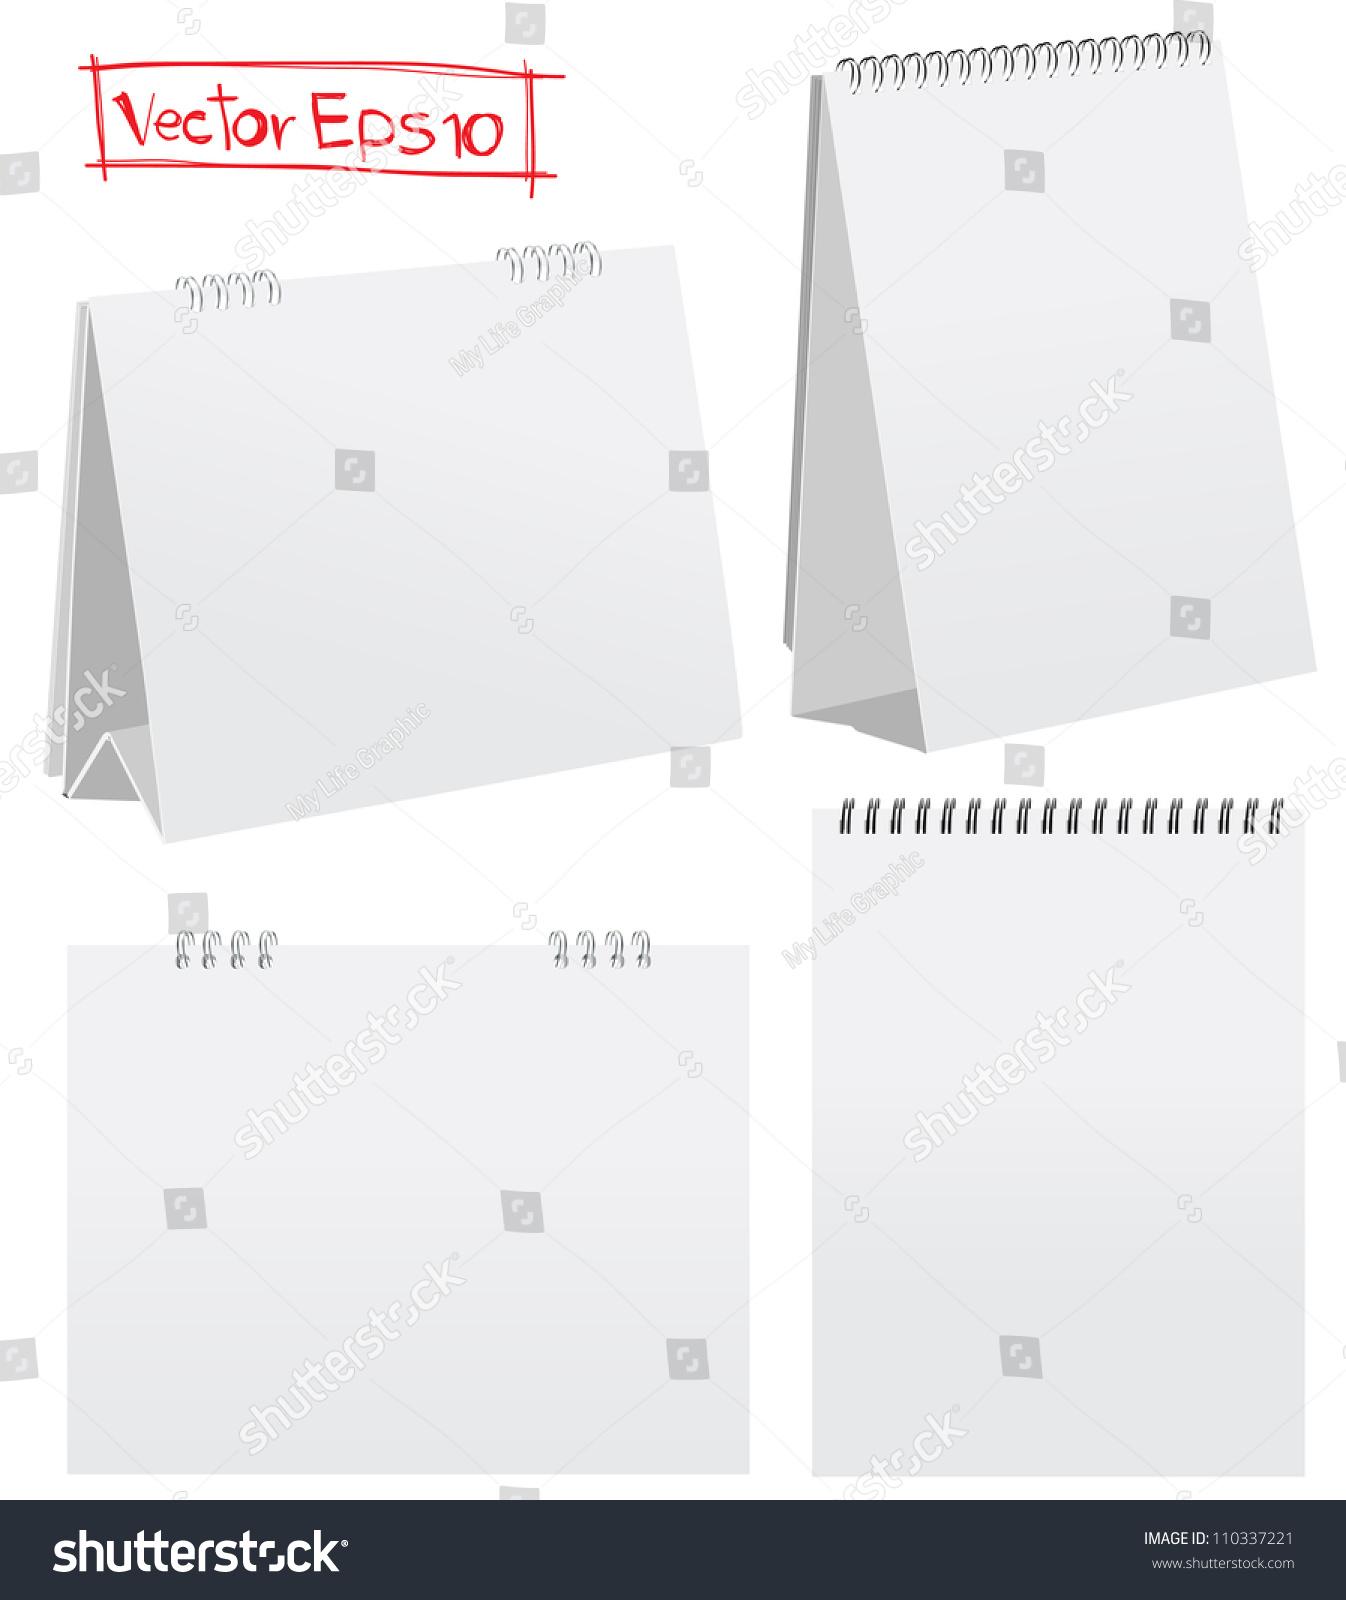 Blank Calendar Vector : Blank desktop calendars vector illustration